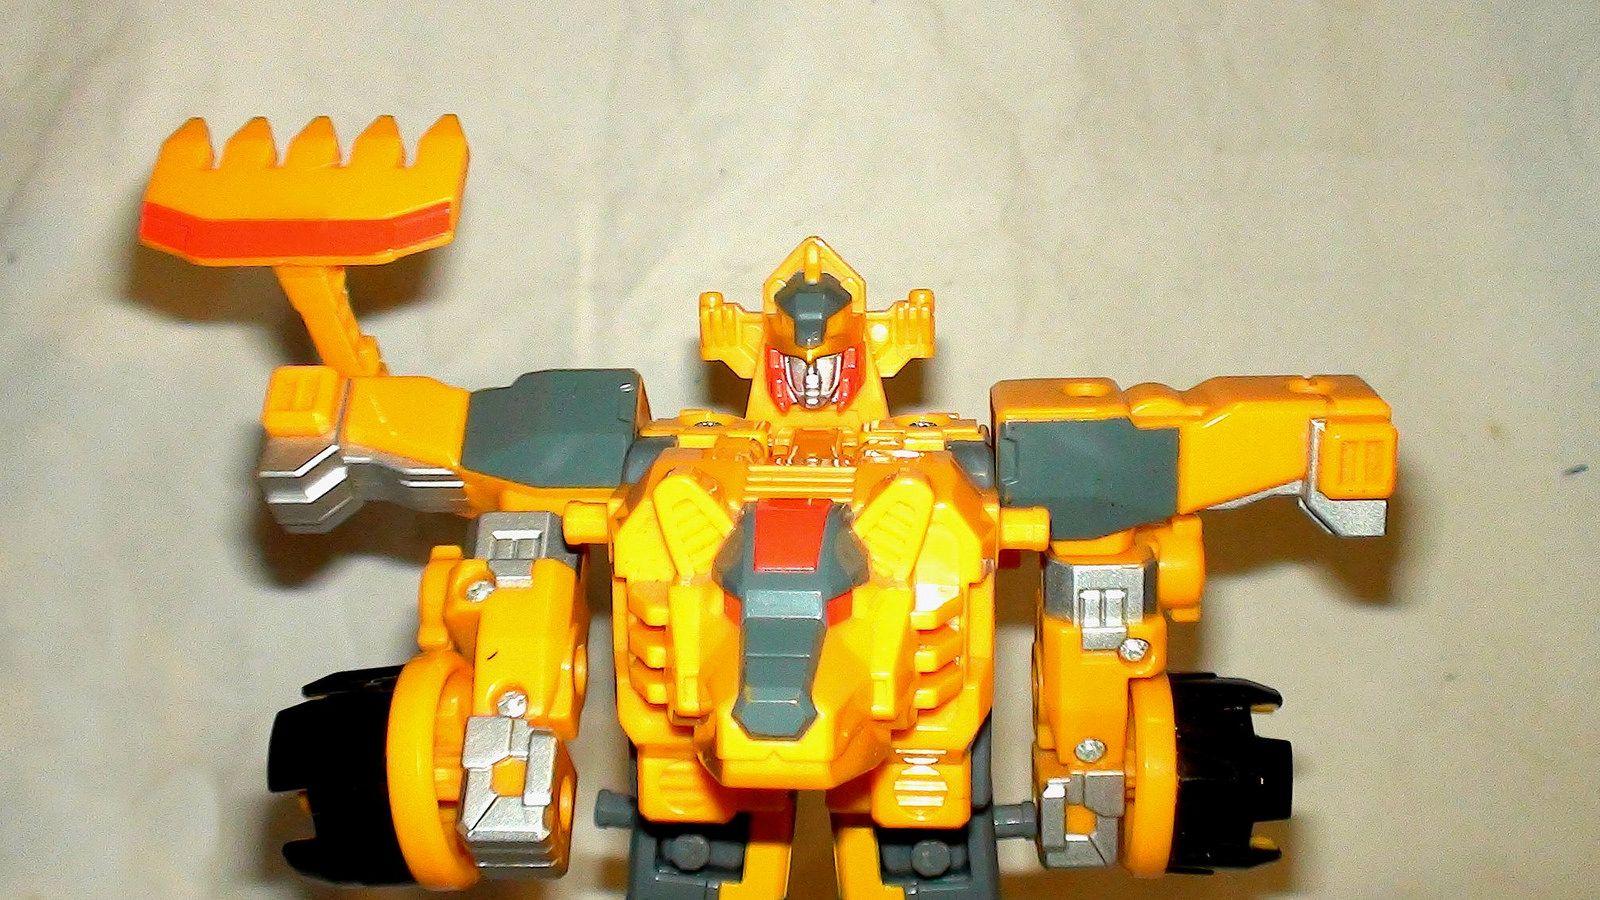 Wanrikikuma  robot (coreroid + bine parts)